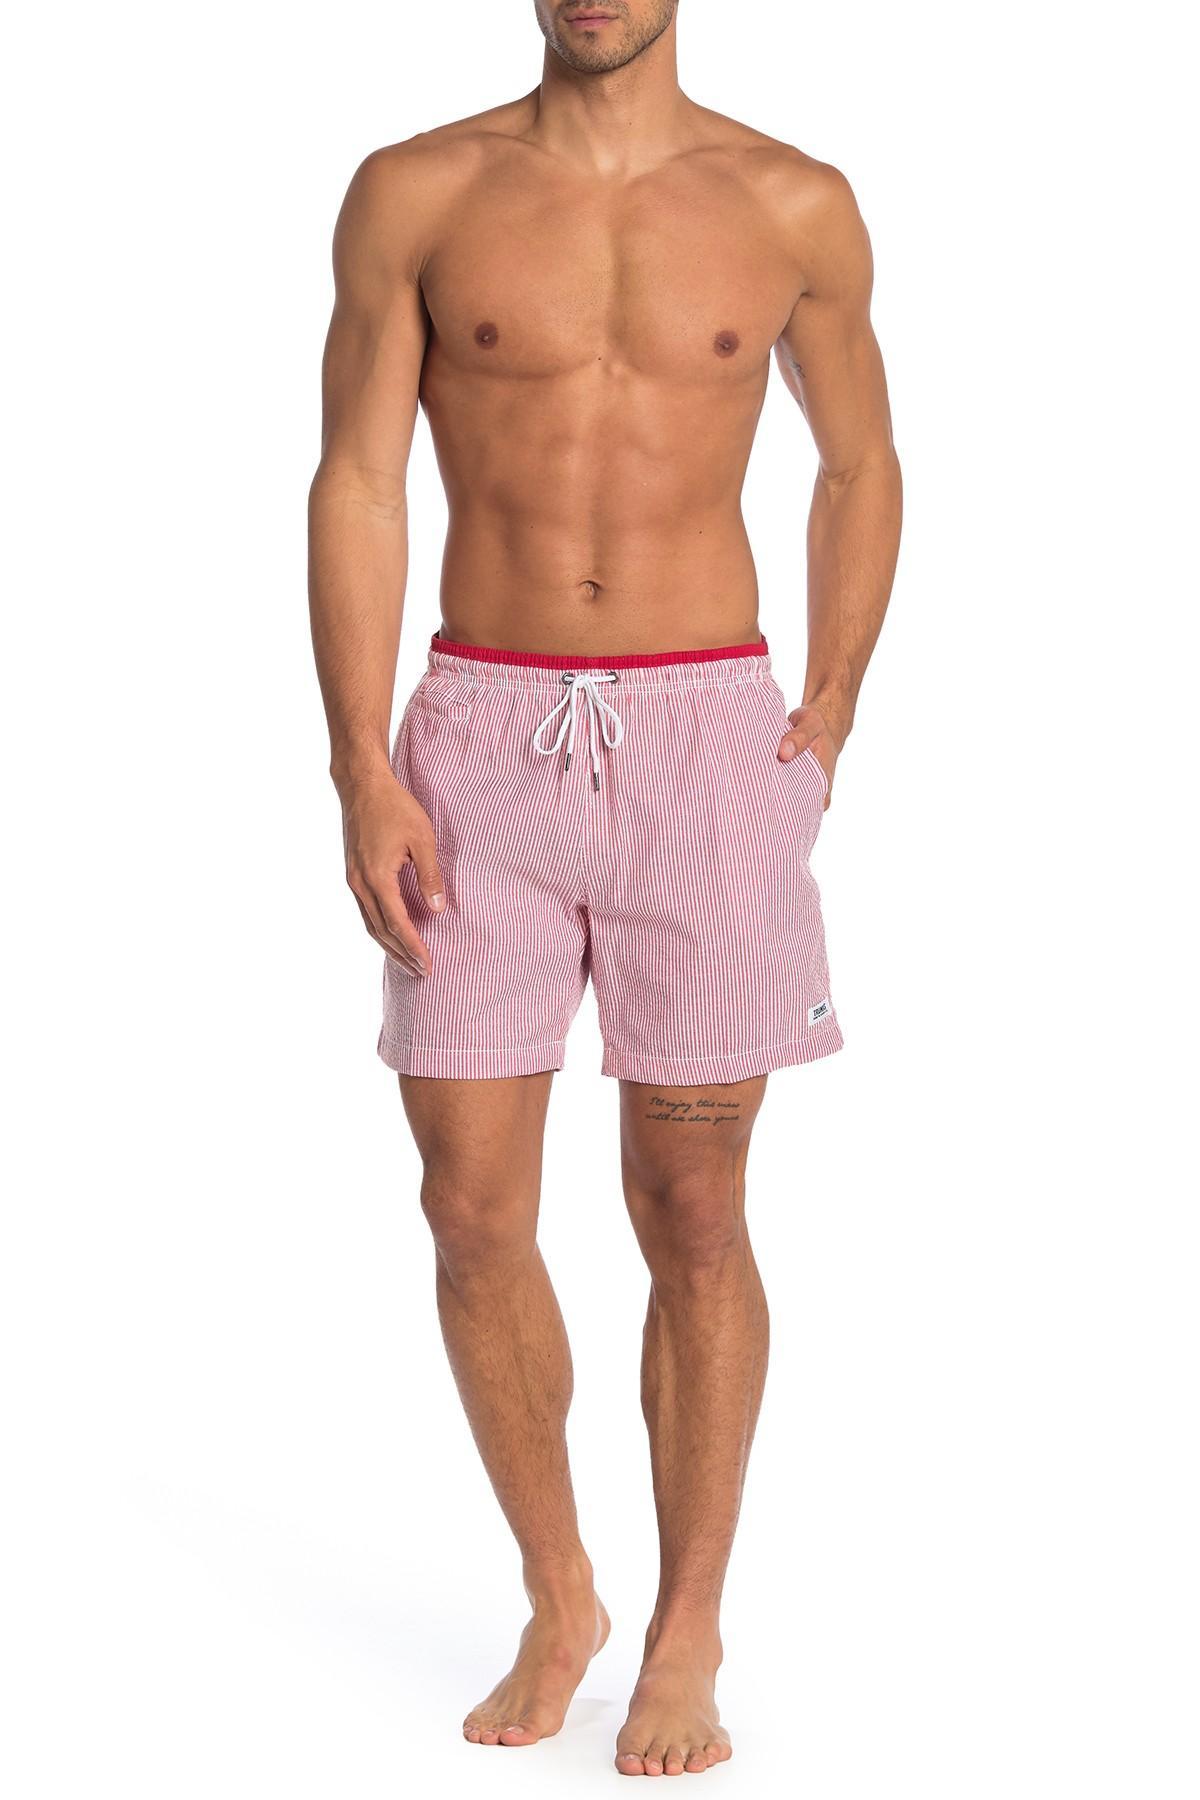 9964220955cde Lyst - TRUNKS SURF AND SWIM CO Premium Striped Sano Swim Shorts in ...